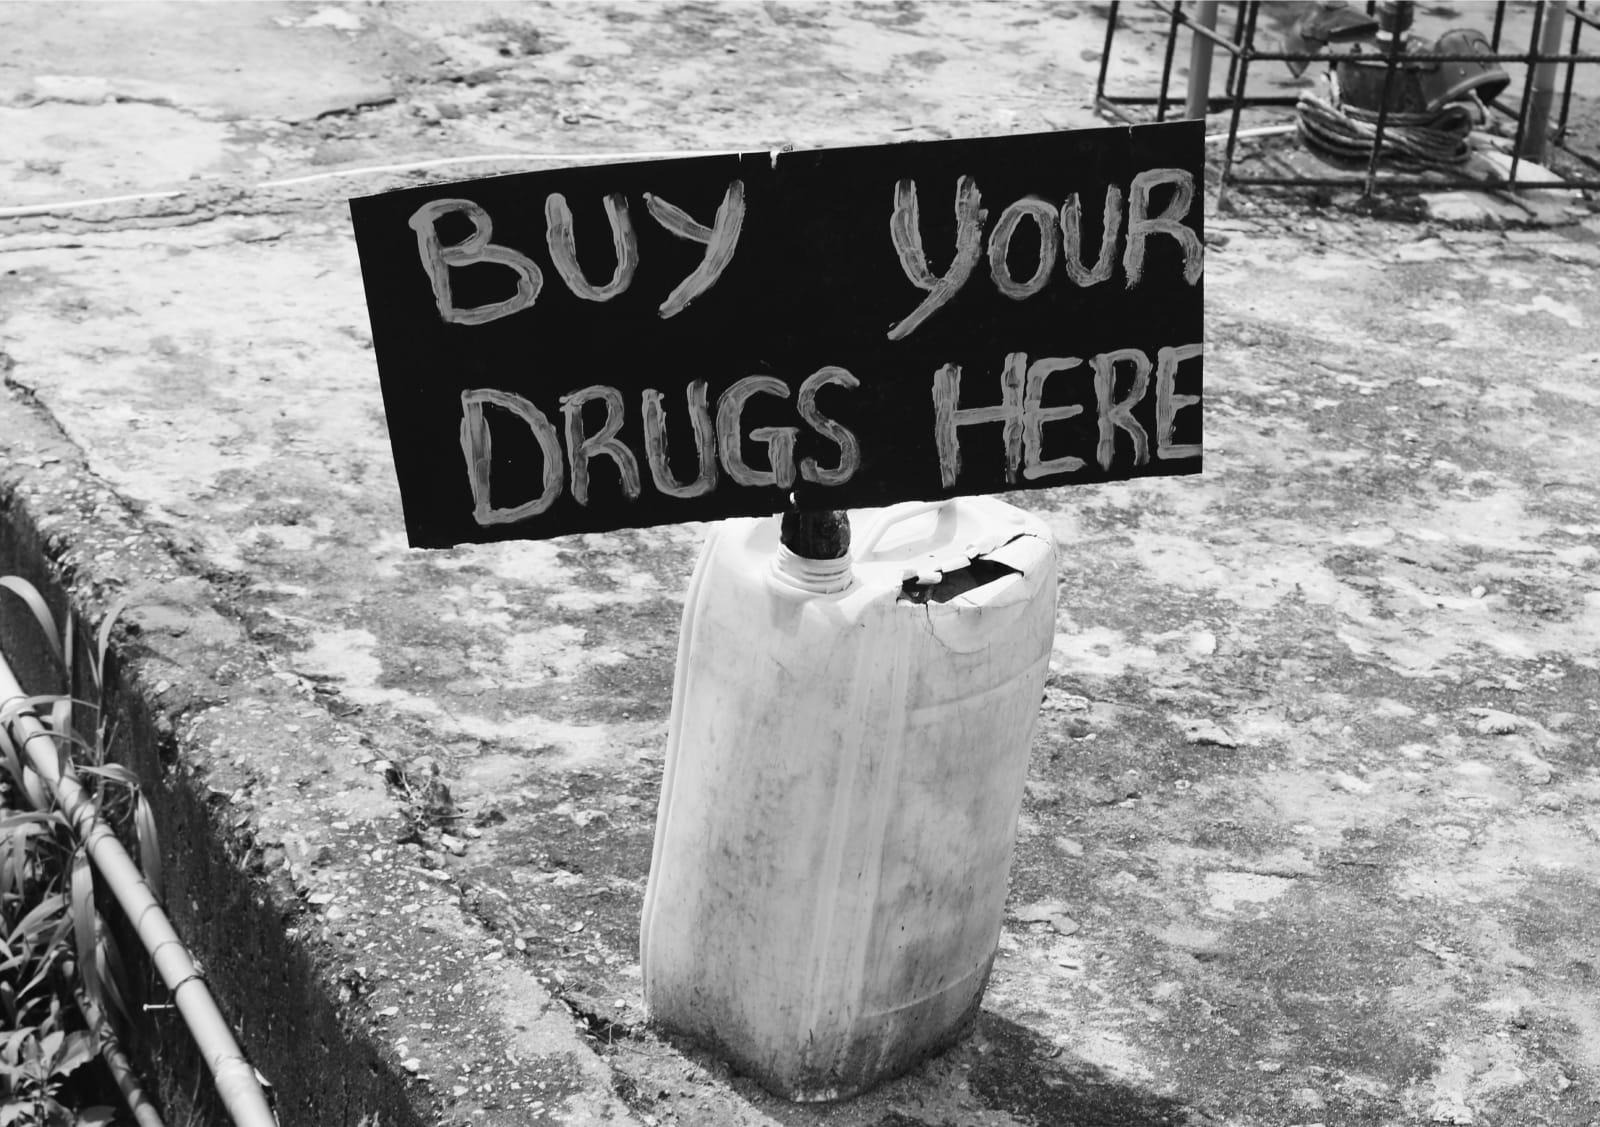 Arinzechukwu Patrick Buy your drugs here 59.4 x 39.59 cm 39.73 x 28 cm 29.7 x 19.8 cm Digital print